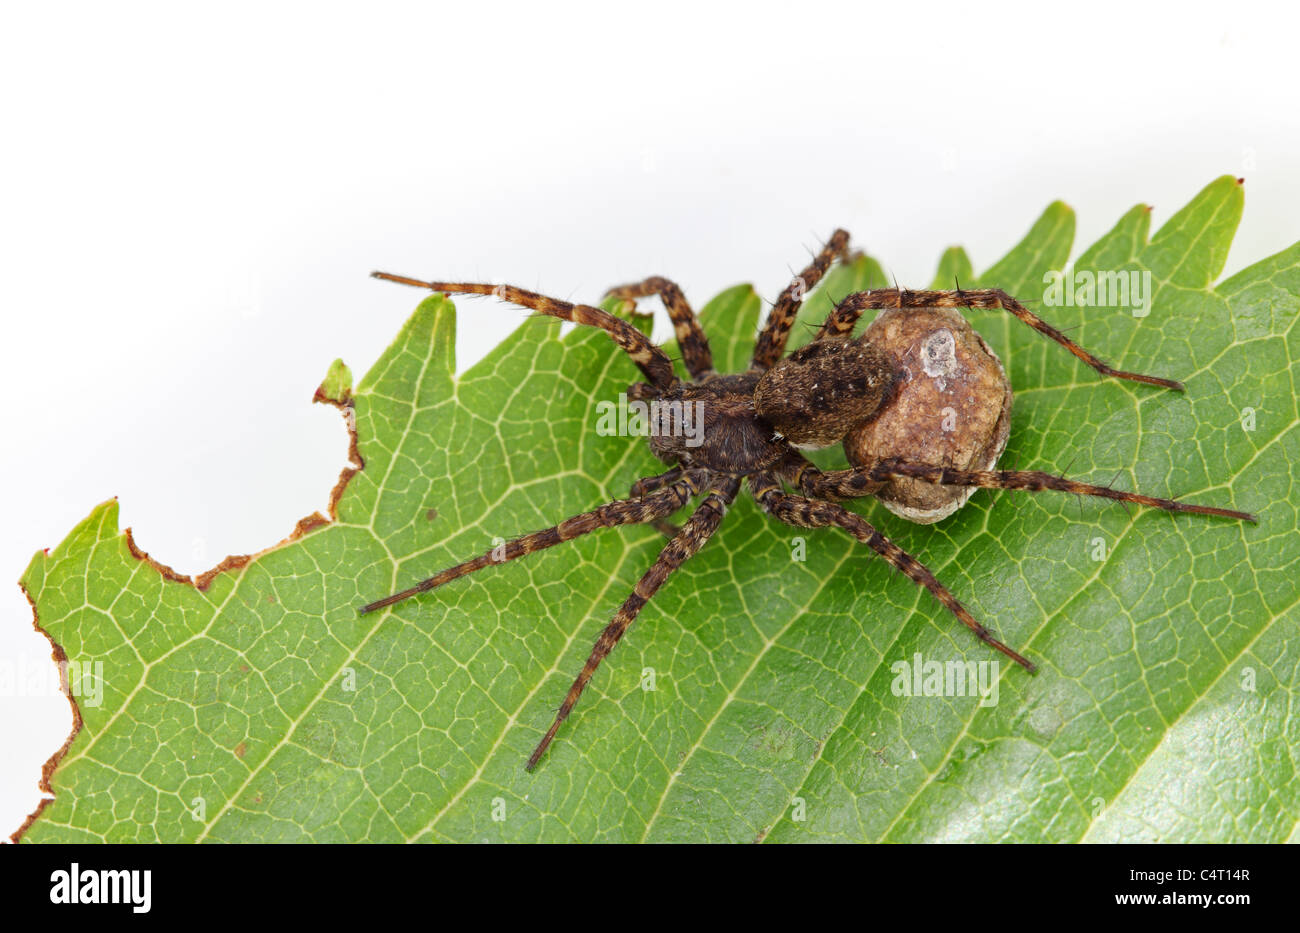 Female Wolf Spider Pardosa Sp With Egg Sac - Stock Image